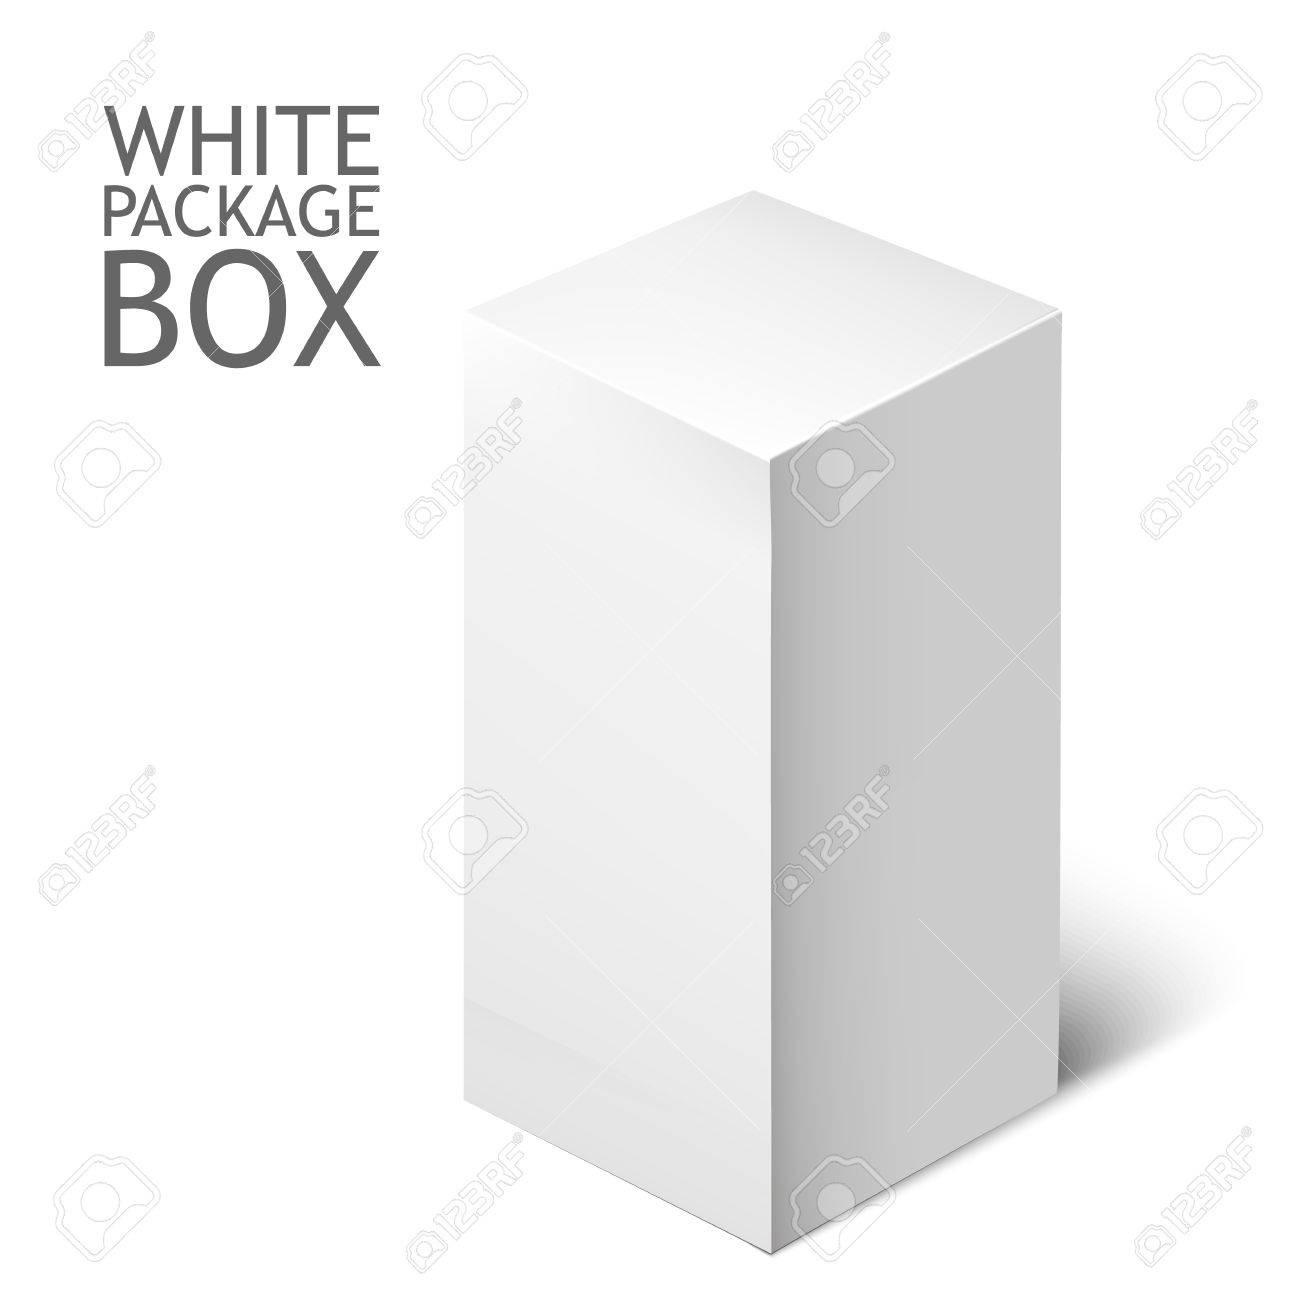 Caja De Cartón Del Paquete. Blanca Plaza Paquete Por Software, DVD ...